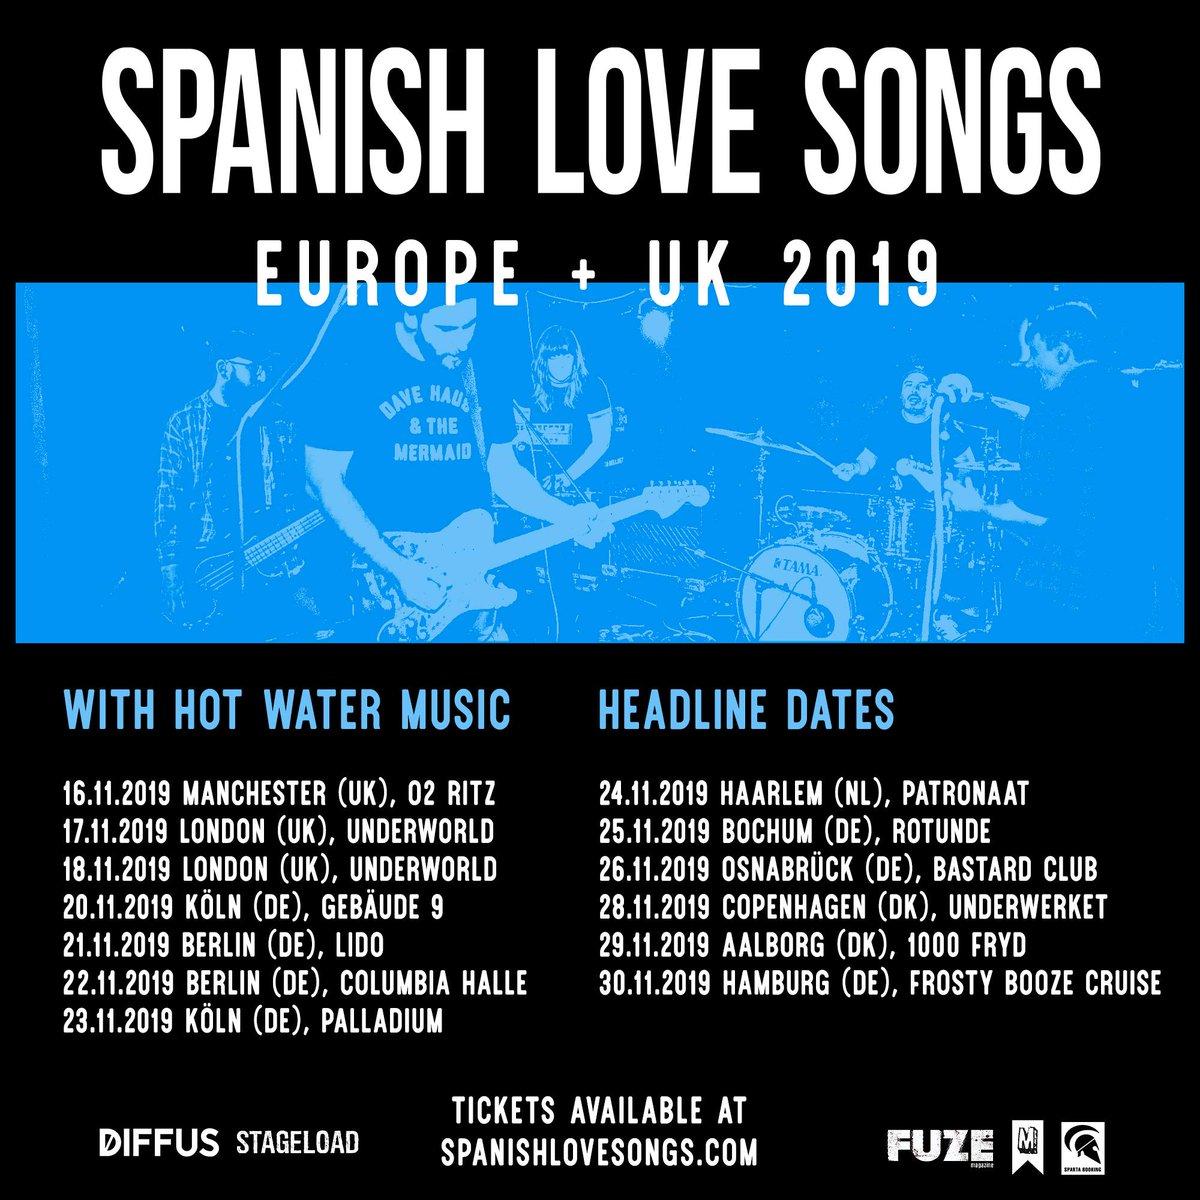 Spanish Love Songs (@SpanishLuvSongs) | Twitter